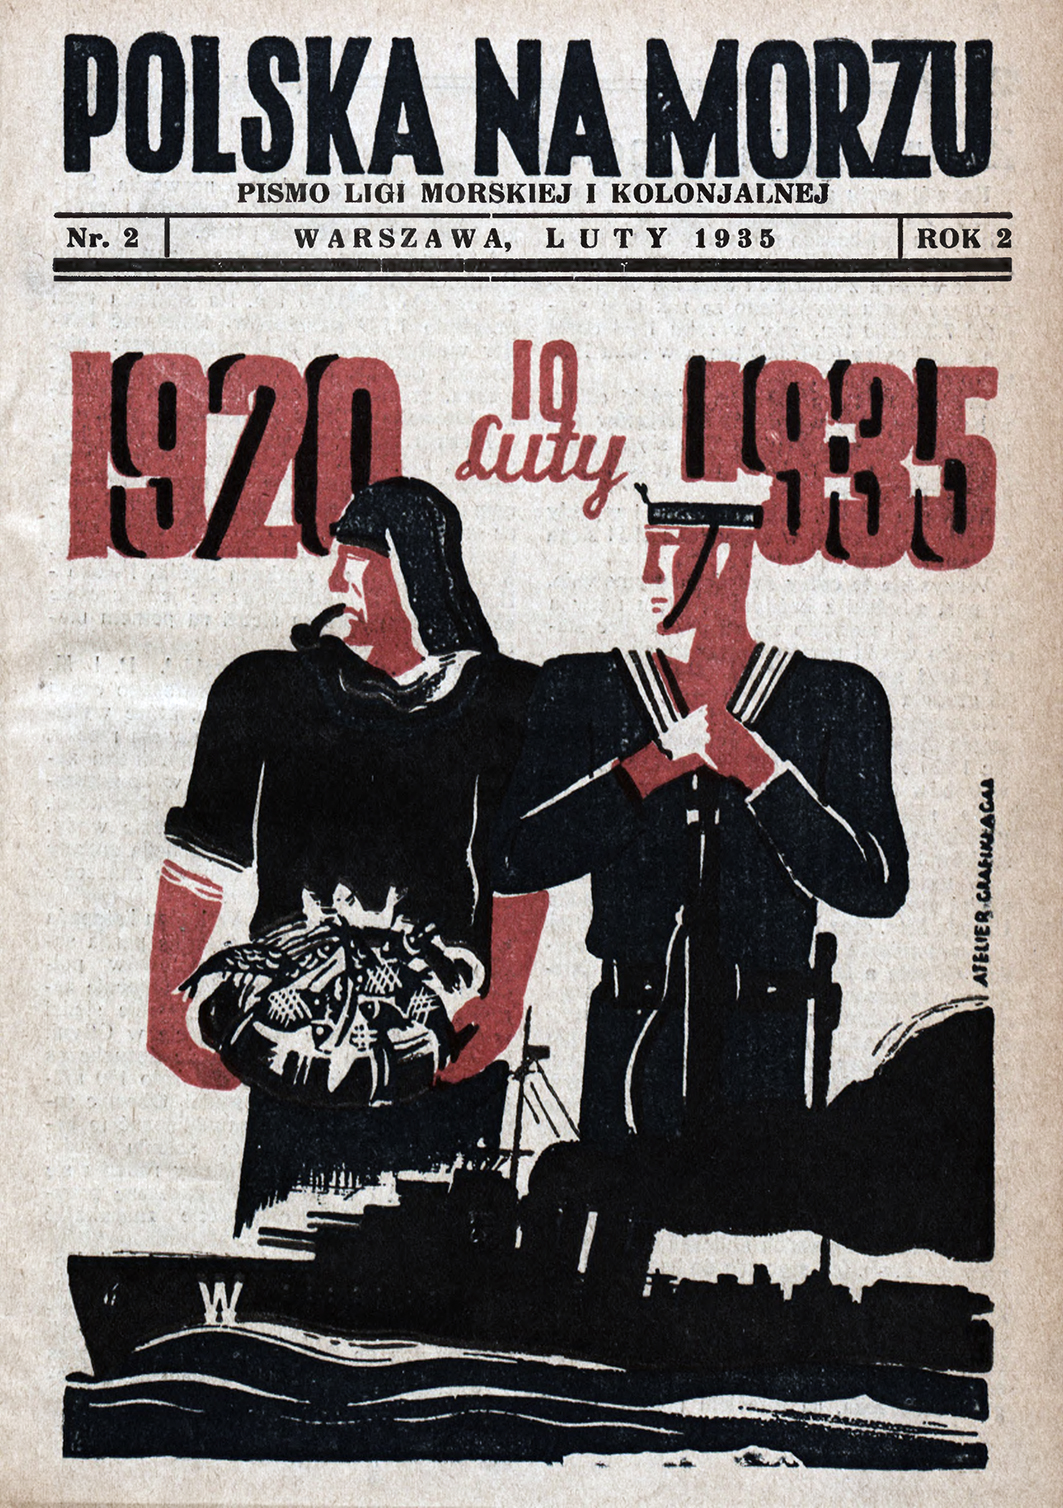 Polska na Morzu : pismo Ligi Morskiej i Kolonjalnej. - Liga Morska i Kolonialna, 1935, nr 2